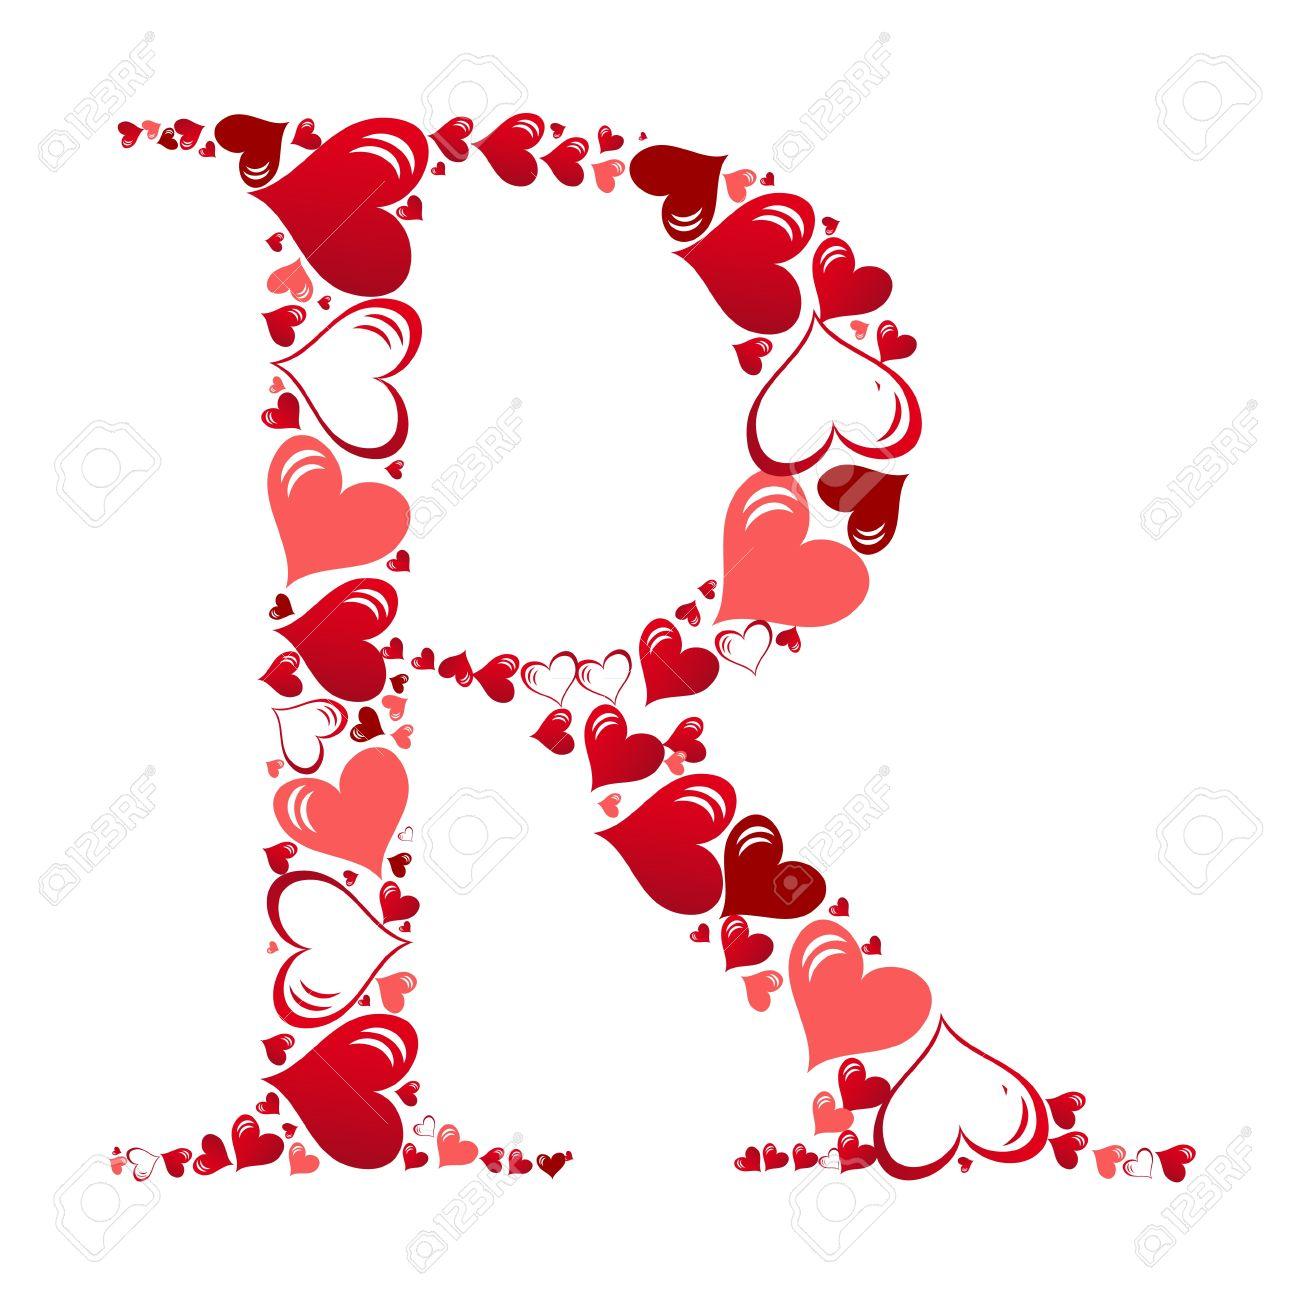 Alphabet of hearts vector illustration Stock Vector - 11083706